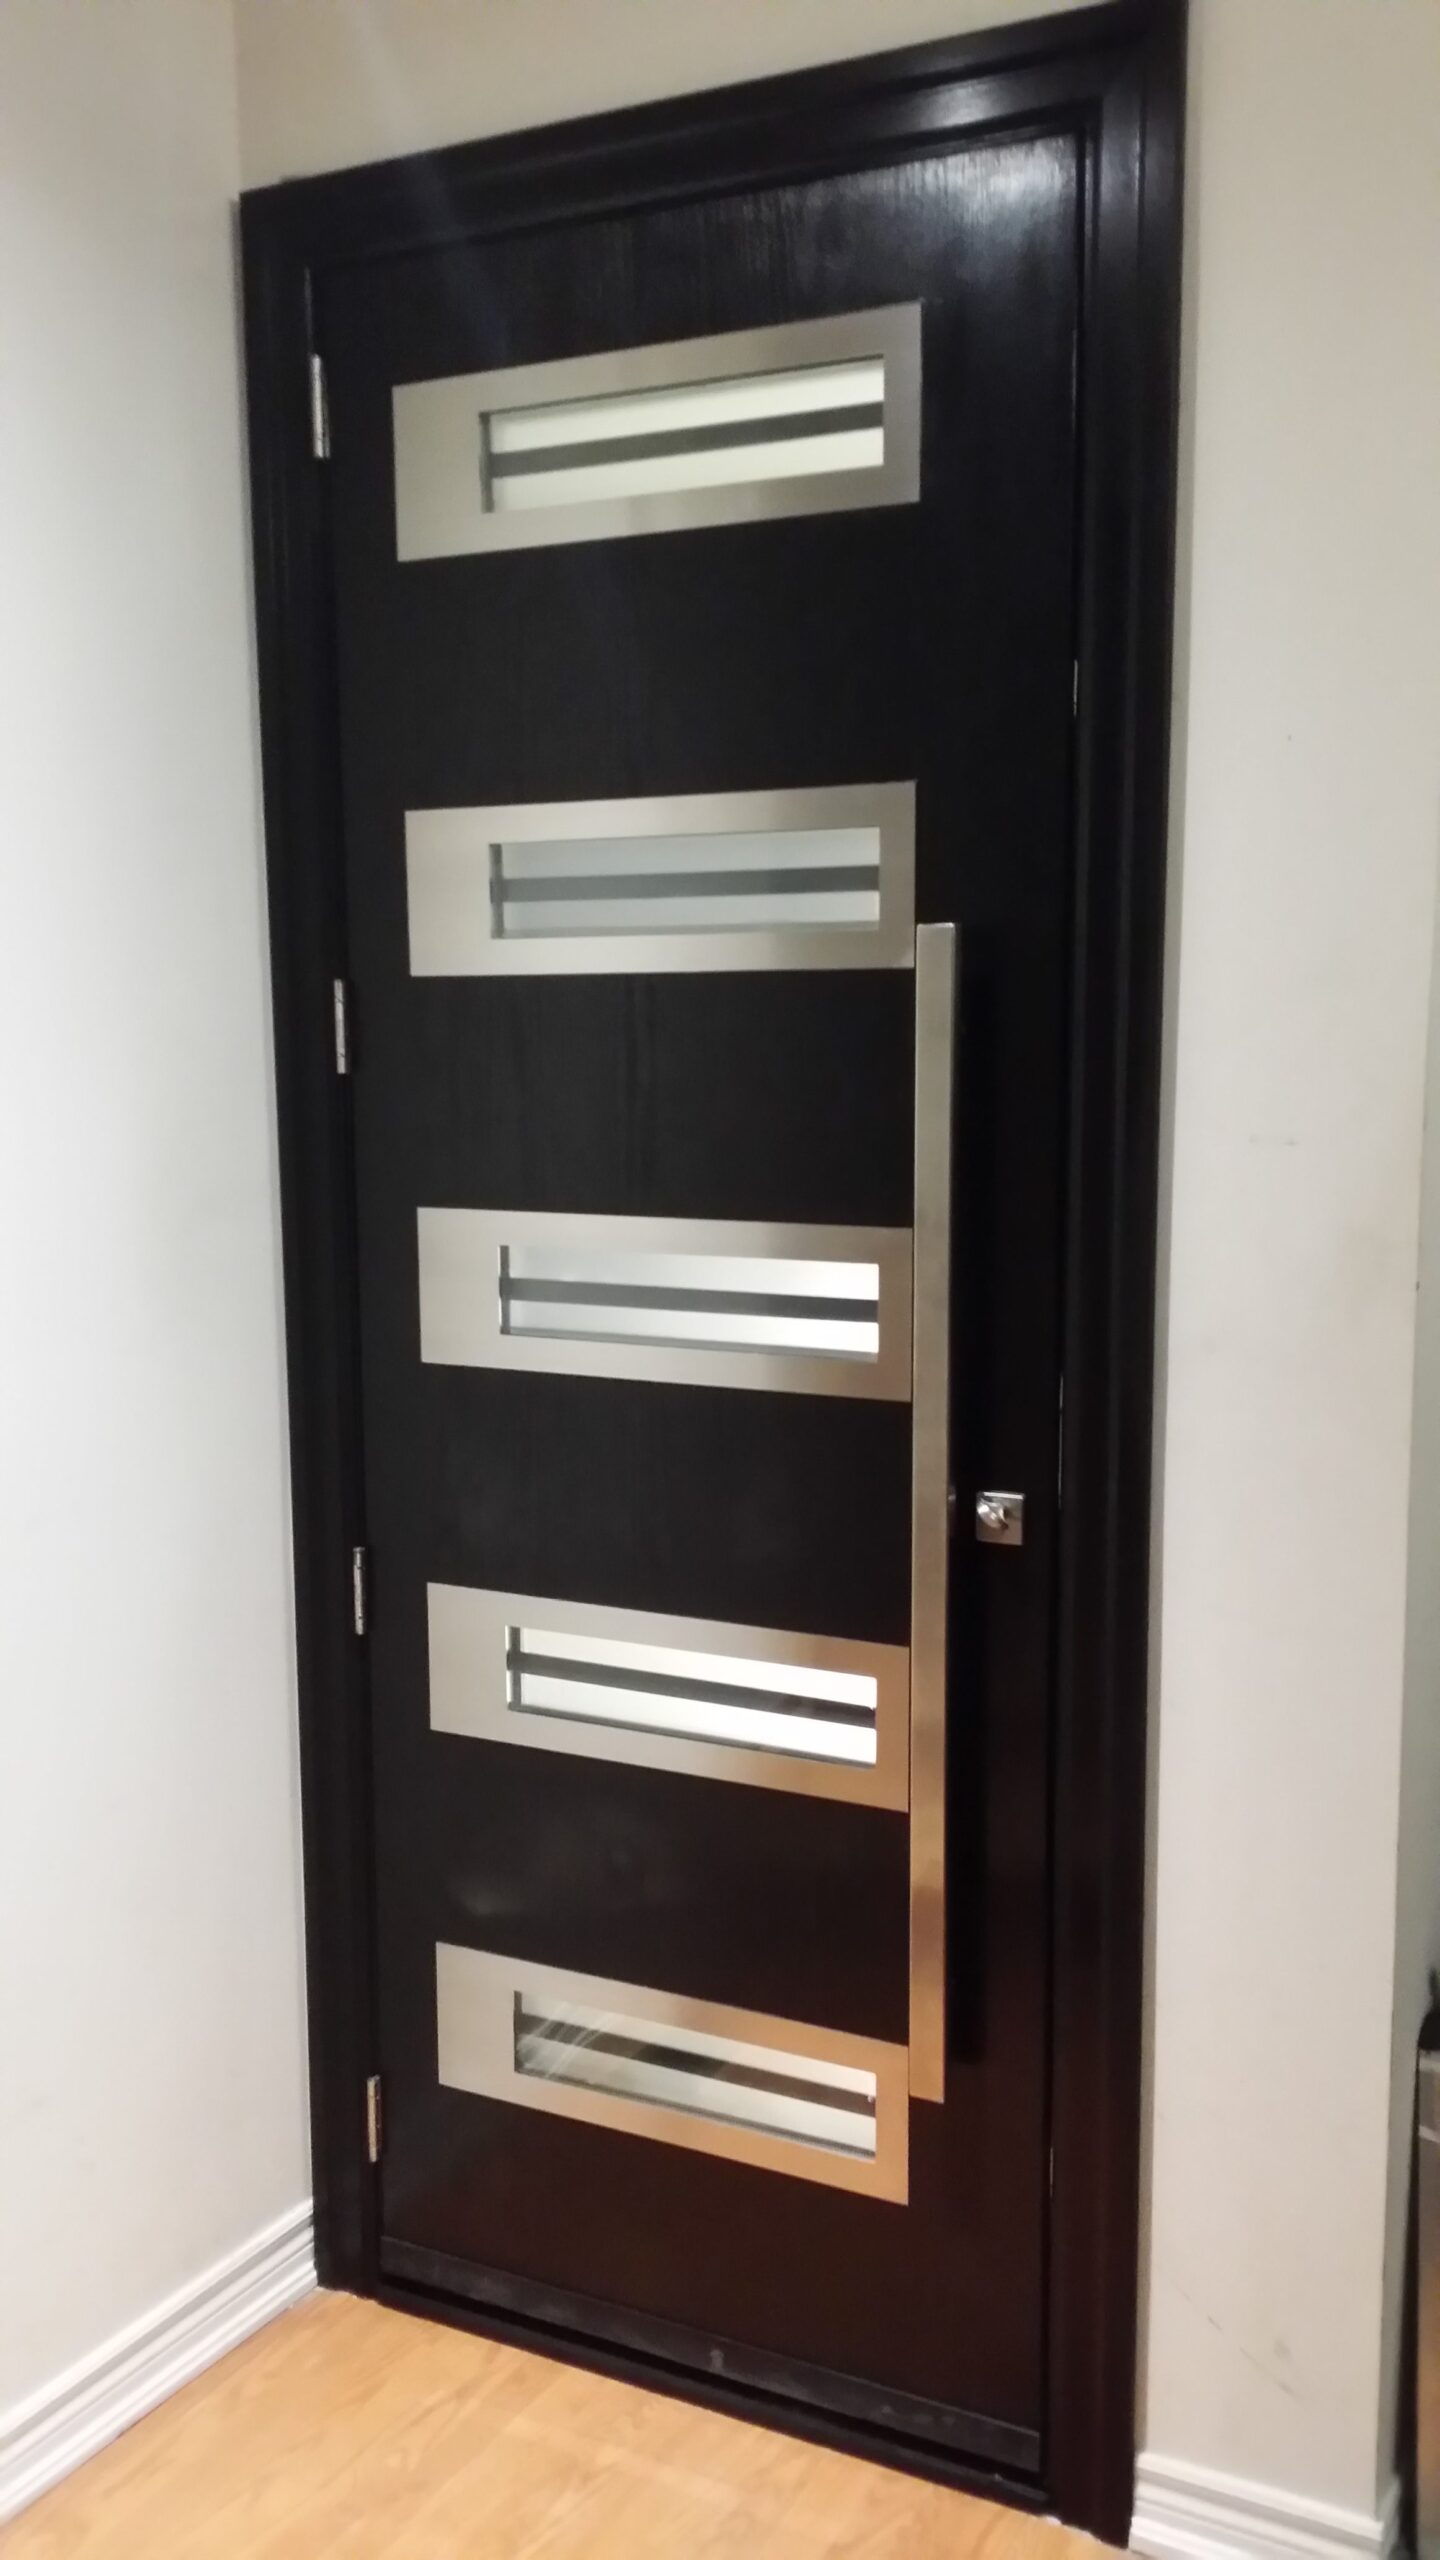 Modern Exterior Glass Stainless Steel Door